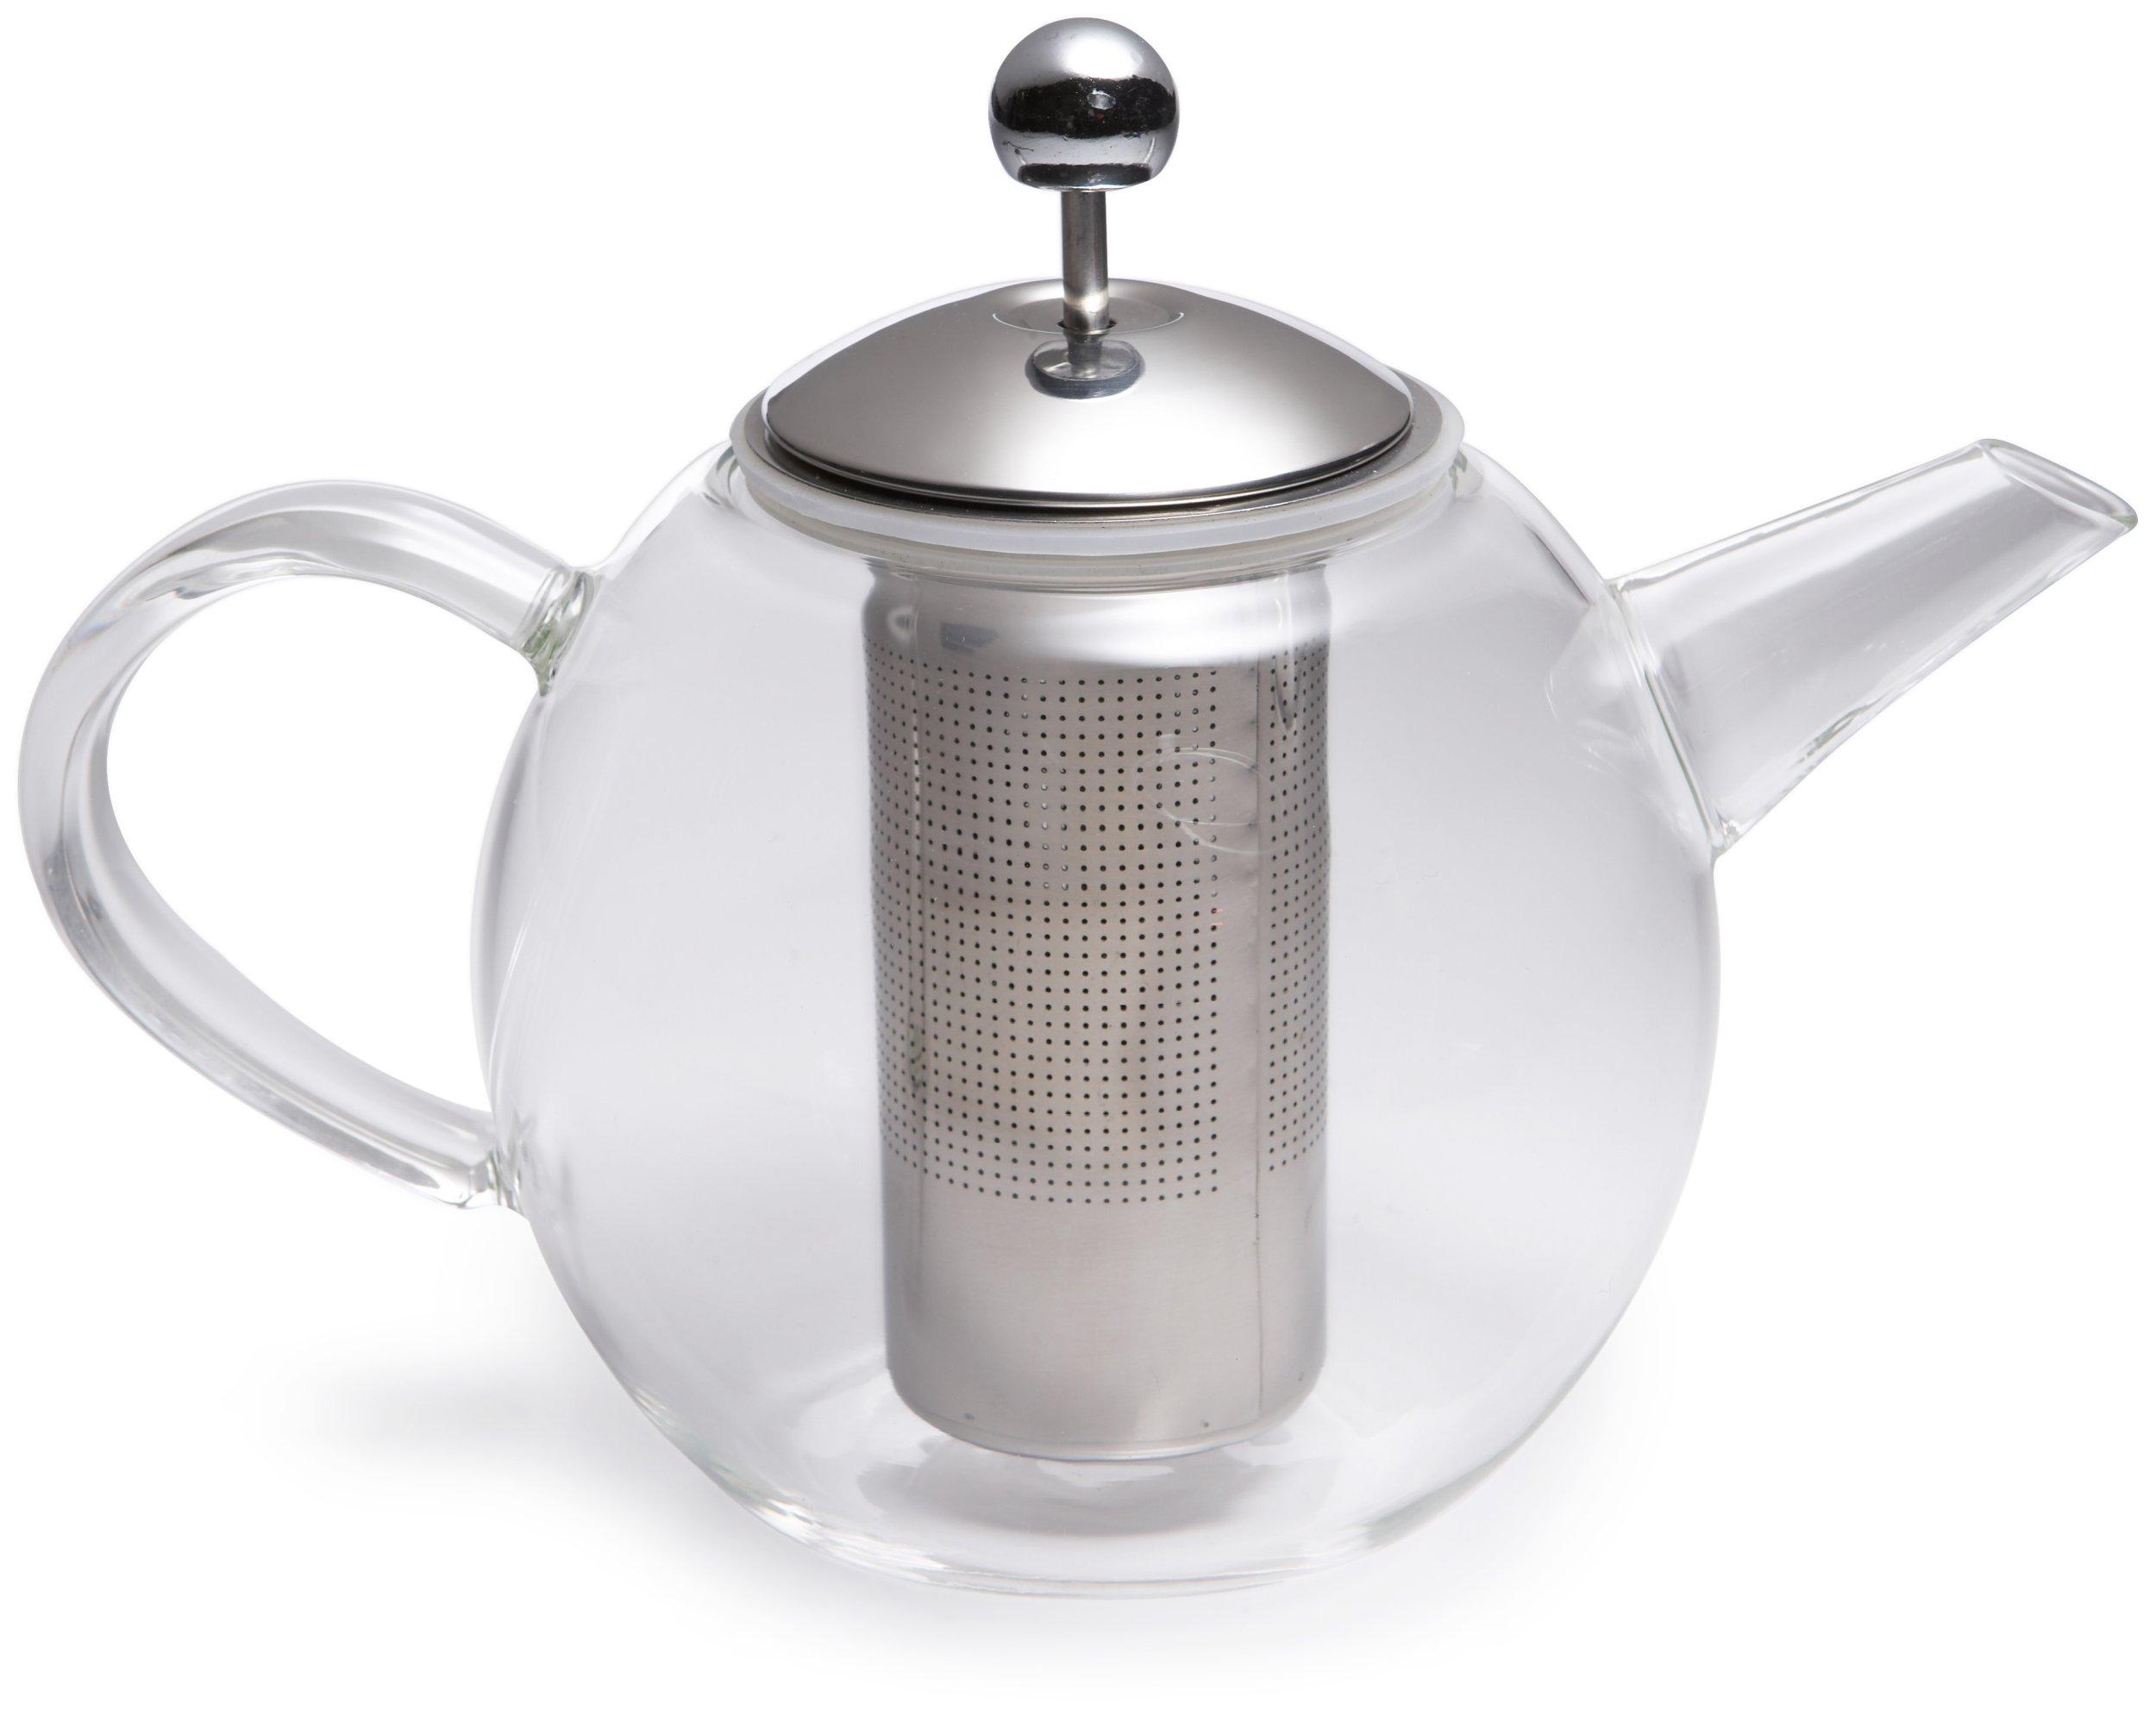 BonJour Tea Handblown Borosilicate Insulated Glass Teapot, Stainless Steel Infuser, 23.7-Ounce